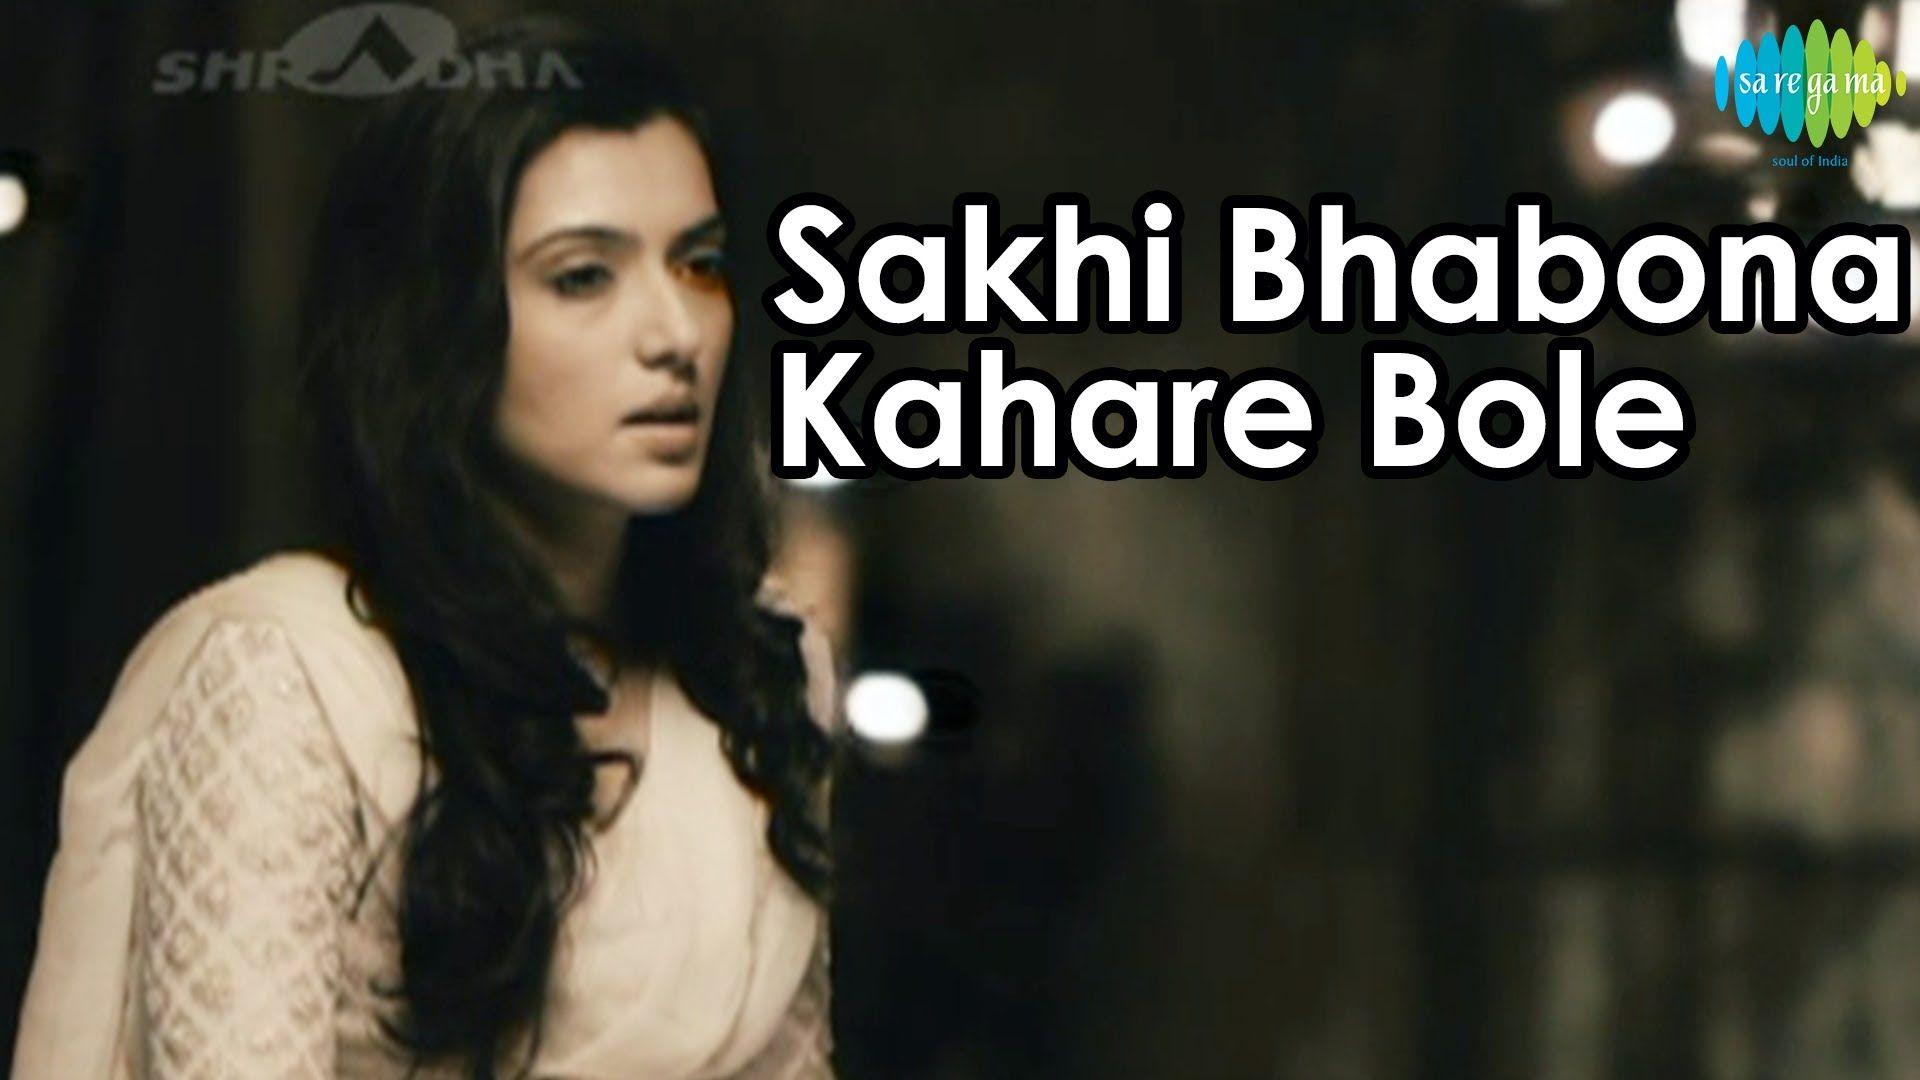 Song :: Sokhi Bhabona Kahare Bole Dhritiman Chattopadhyay